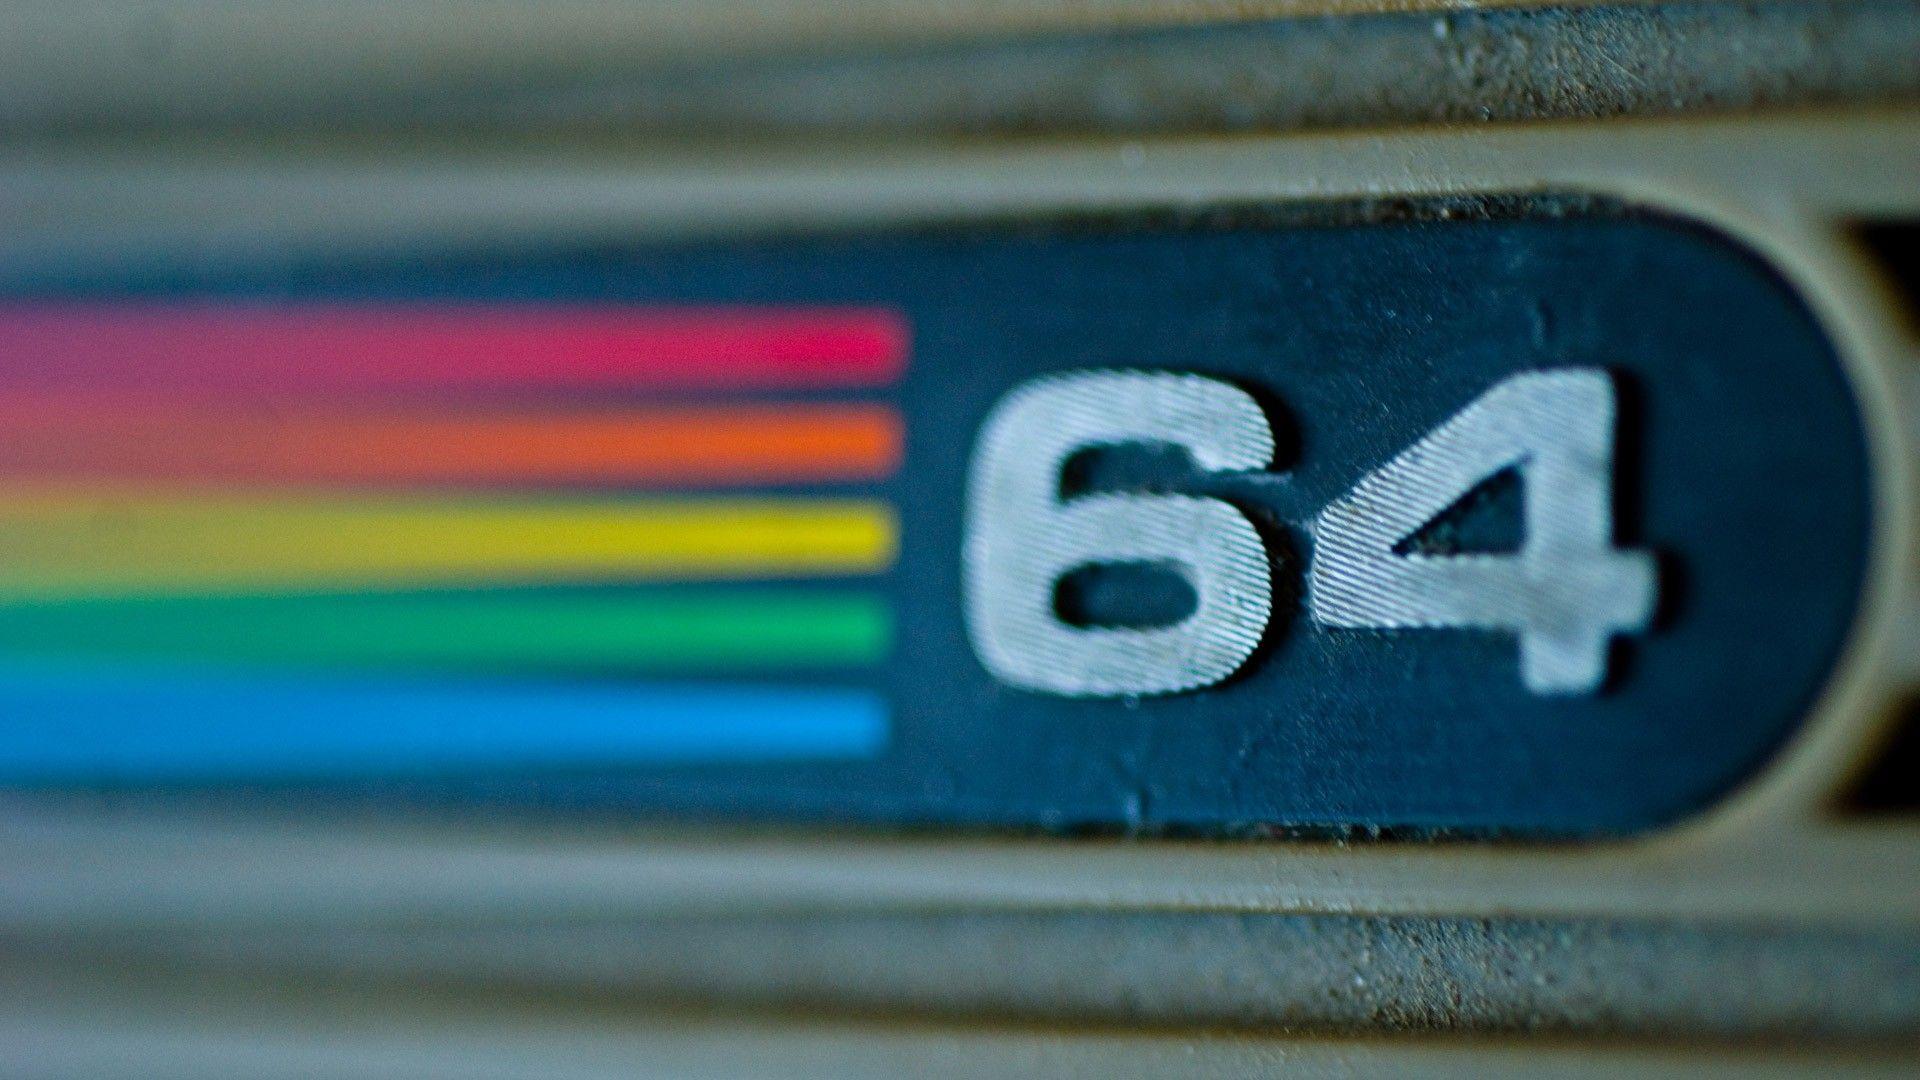 Best 56 Commodore 64 Wallpaper on HipWallpaper Donkey Kong 64 1920x1080